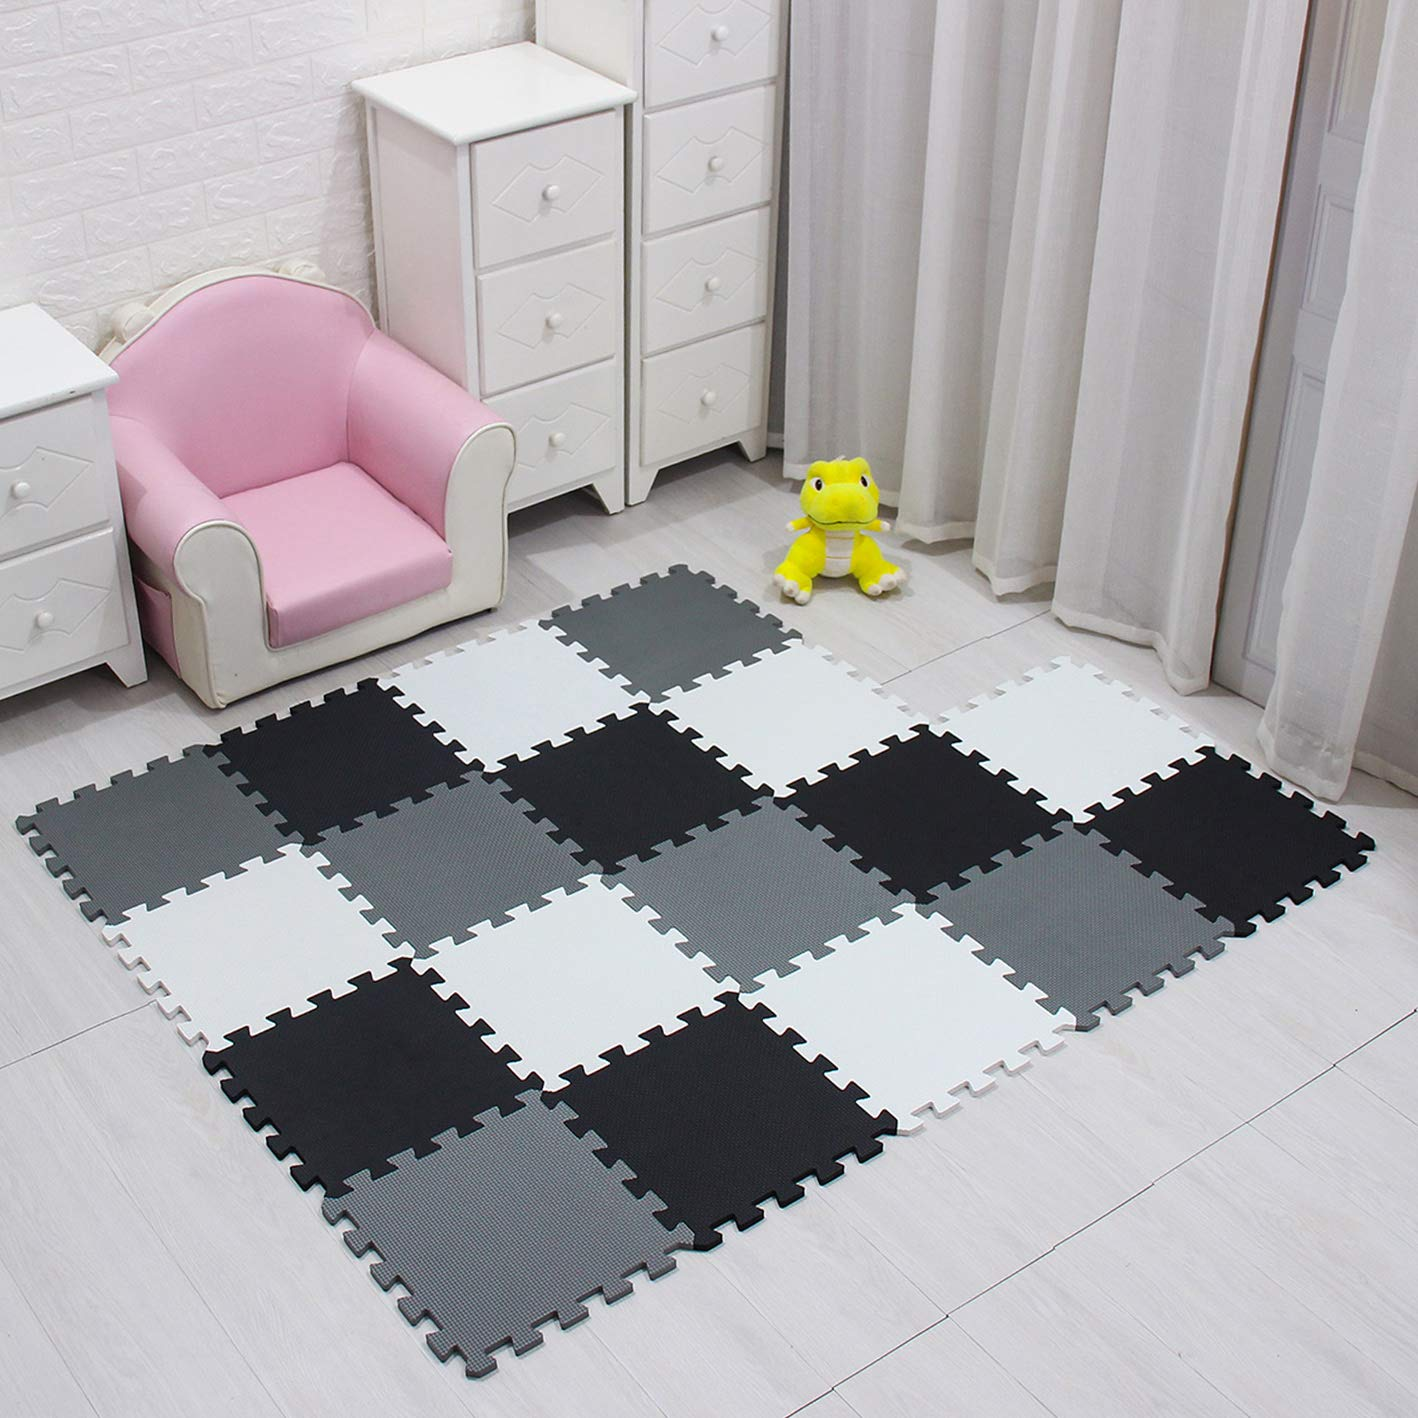 MQIAOHAM children puzzle mat play mat squares foam play mat tiles baby mats for floor puzzle puzzle mat childrens soft play mats girl playmat carpet interlocking foam floor mats for baby beige 110